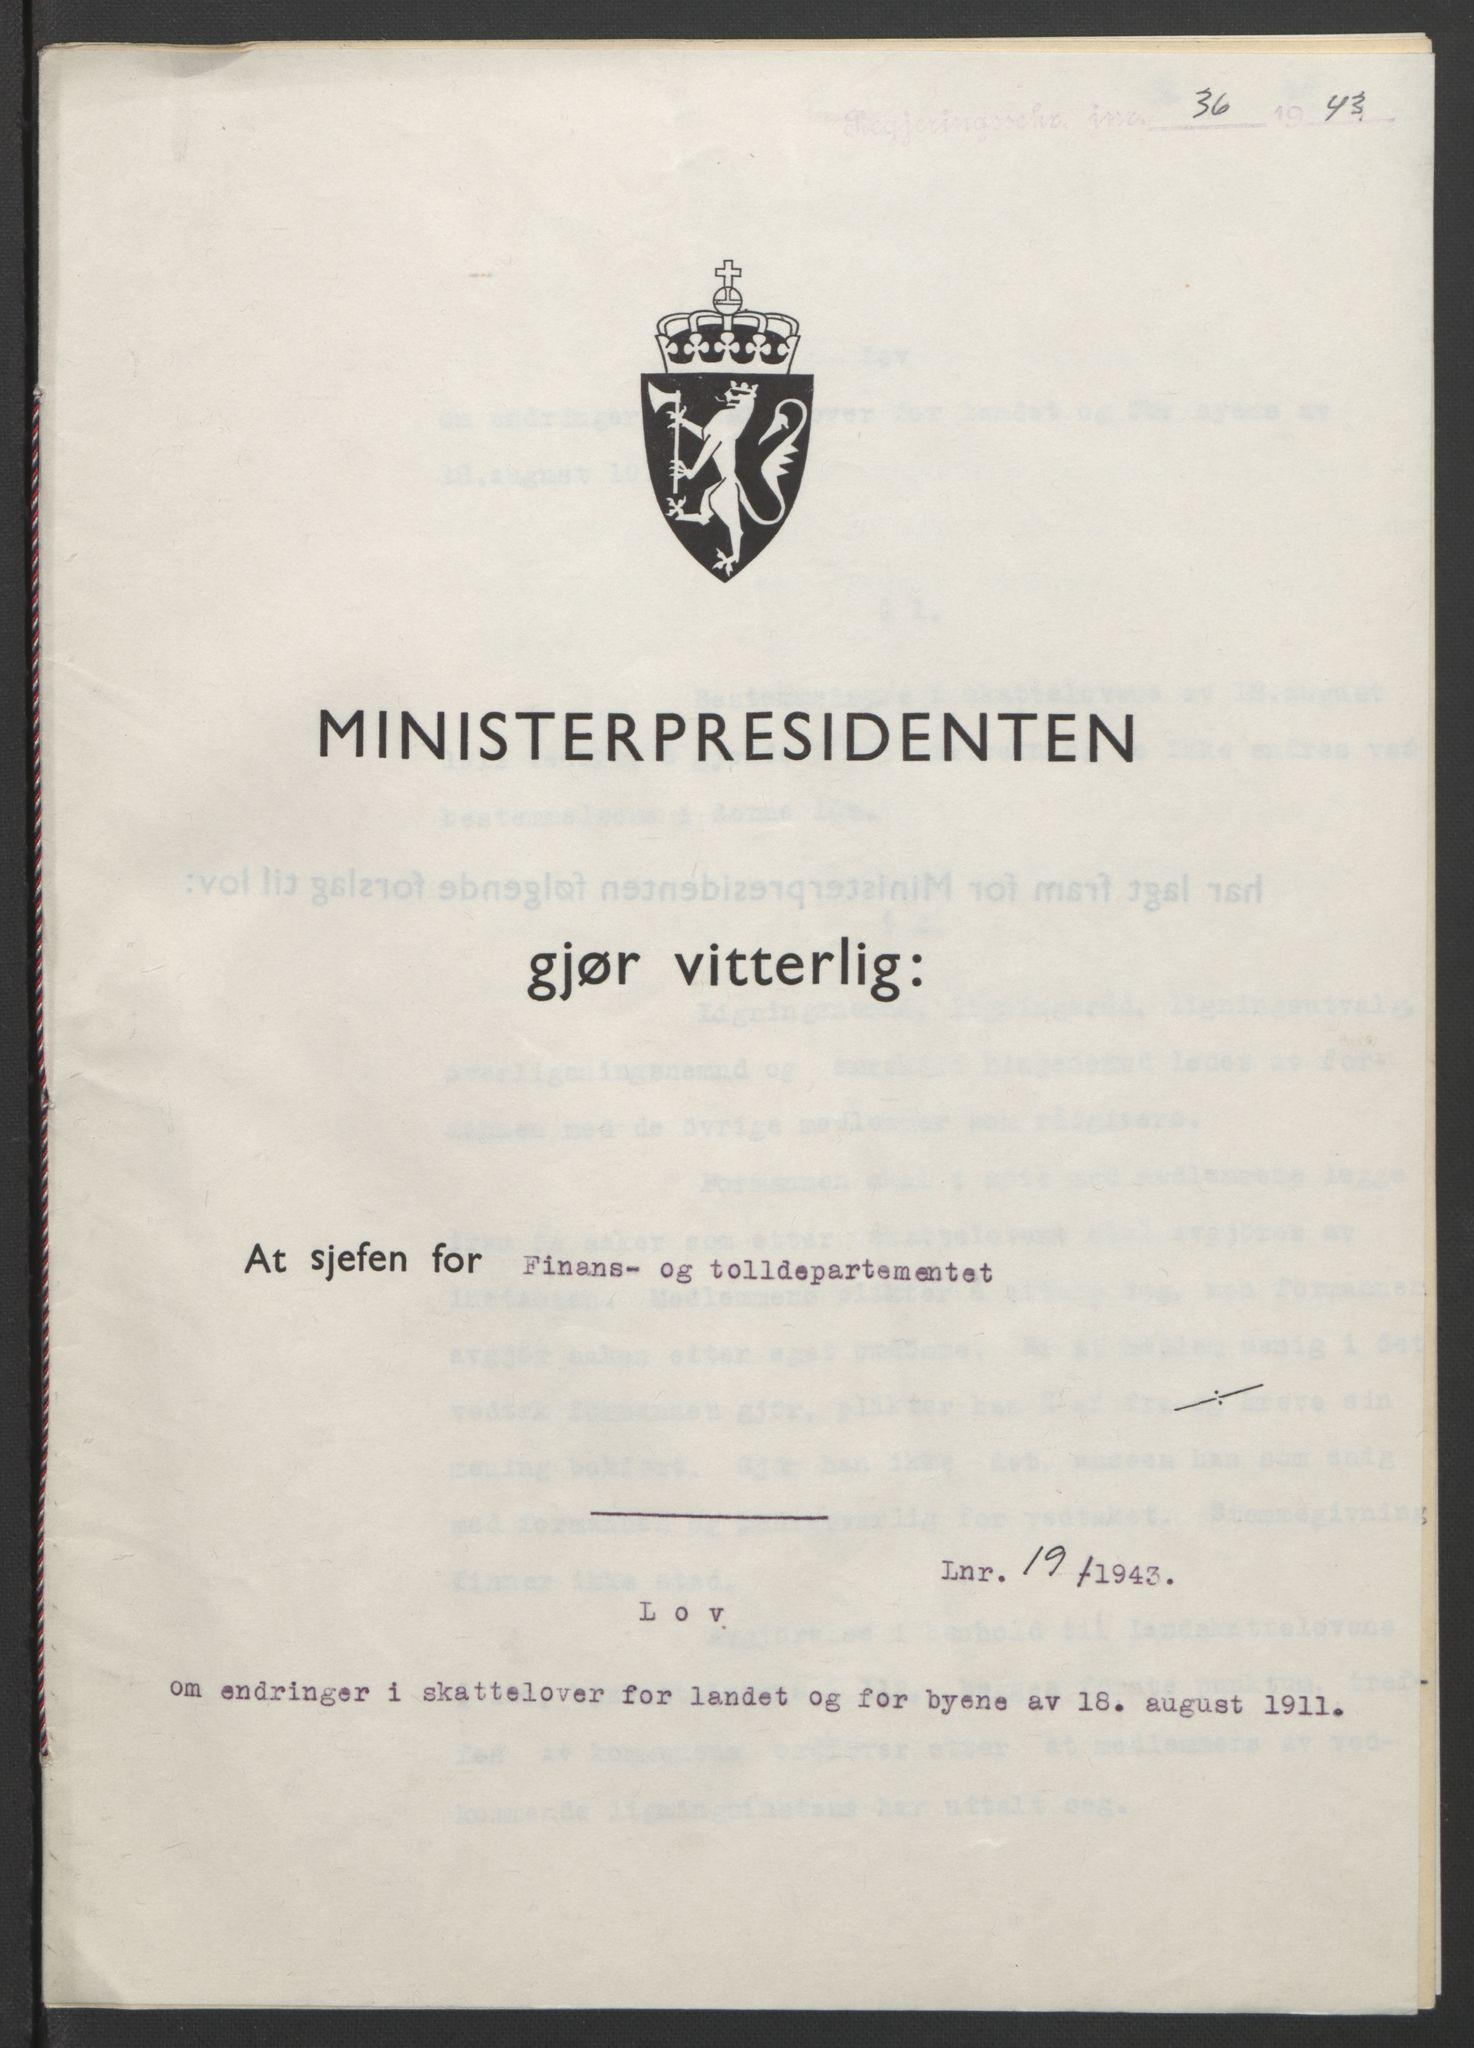 RA, NS-administrasjonen 1940-1945 (Statsrådsekretariatet, de kommisariske statsråder mm), D/Db/L0099: Lover, 1943, s. 76